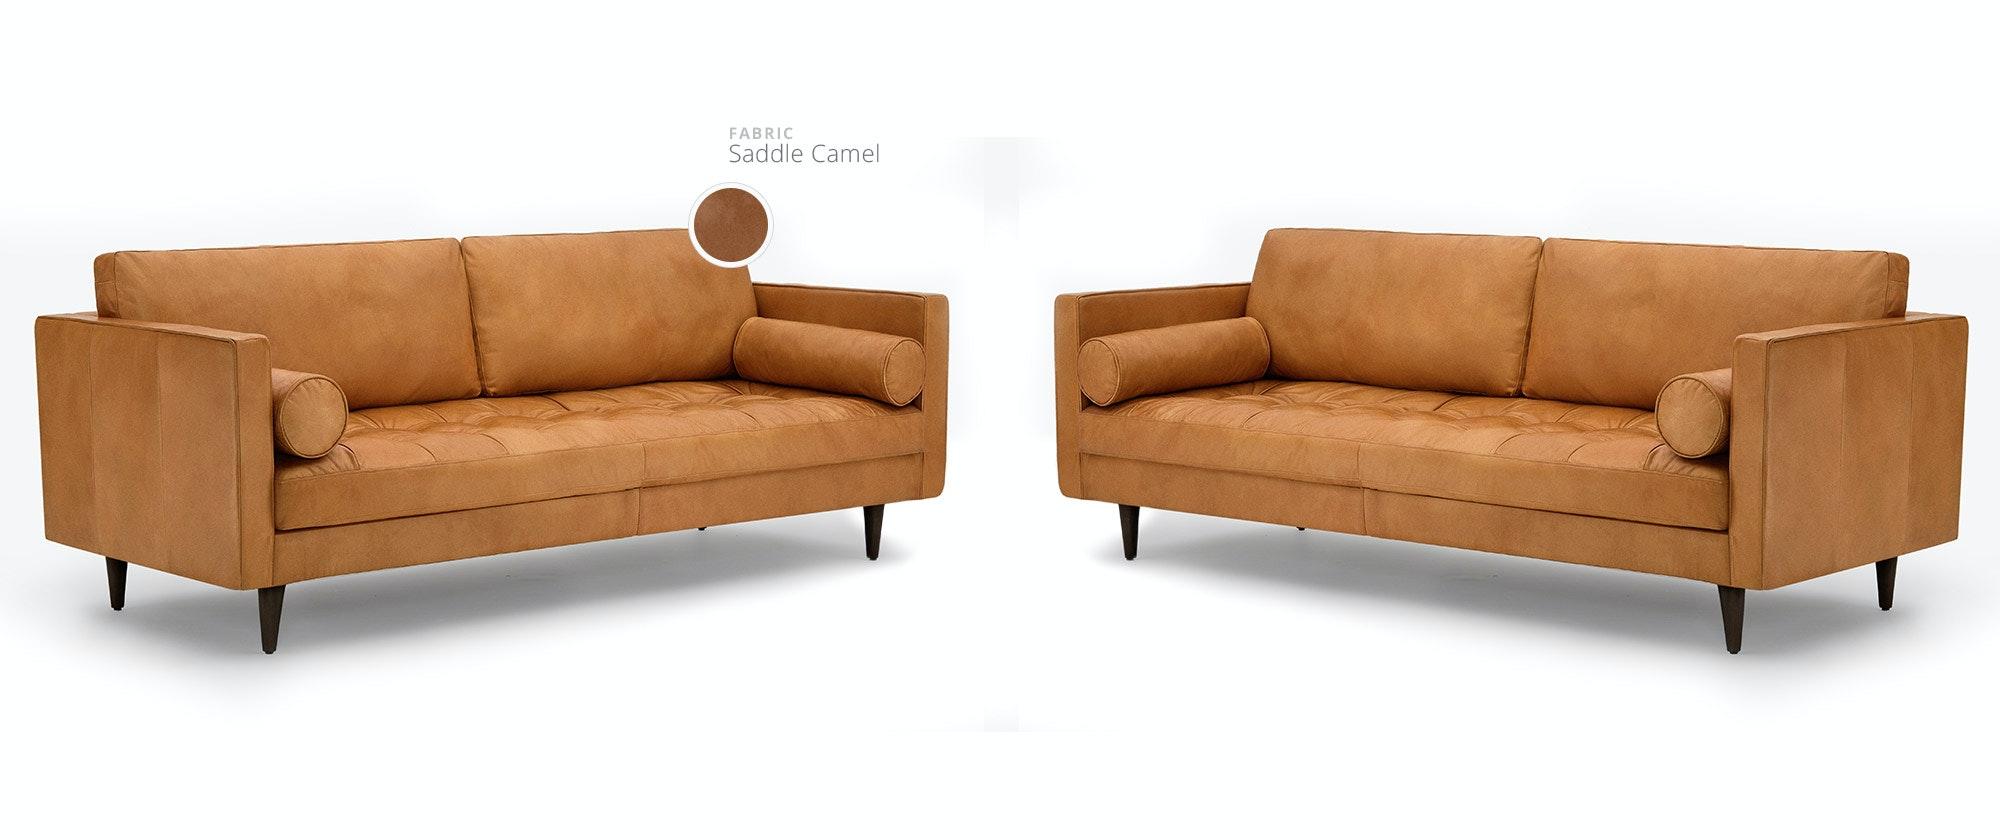 Camel Leather Sofa Leather Camel Back Sofa Foter Thesofa